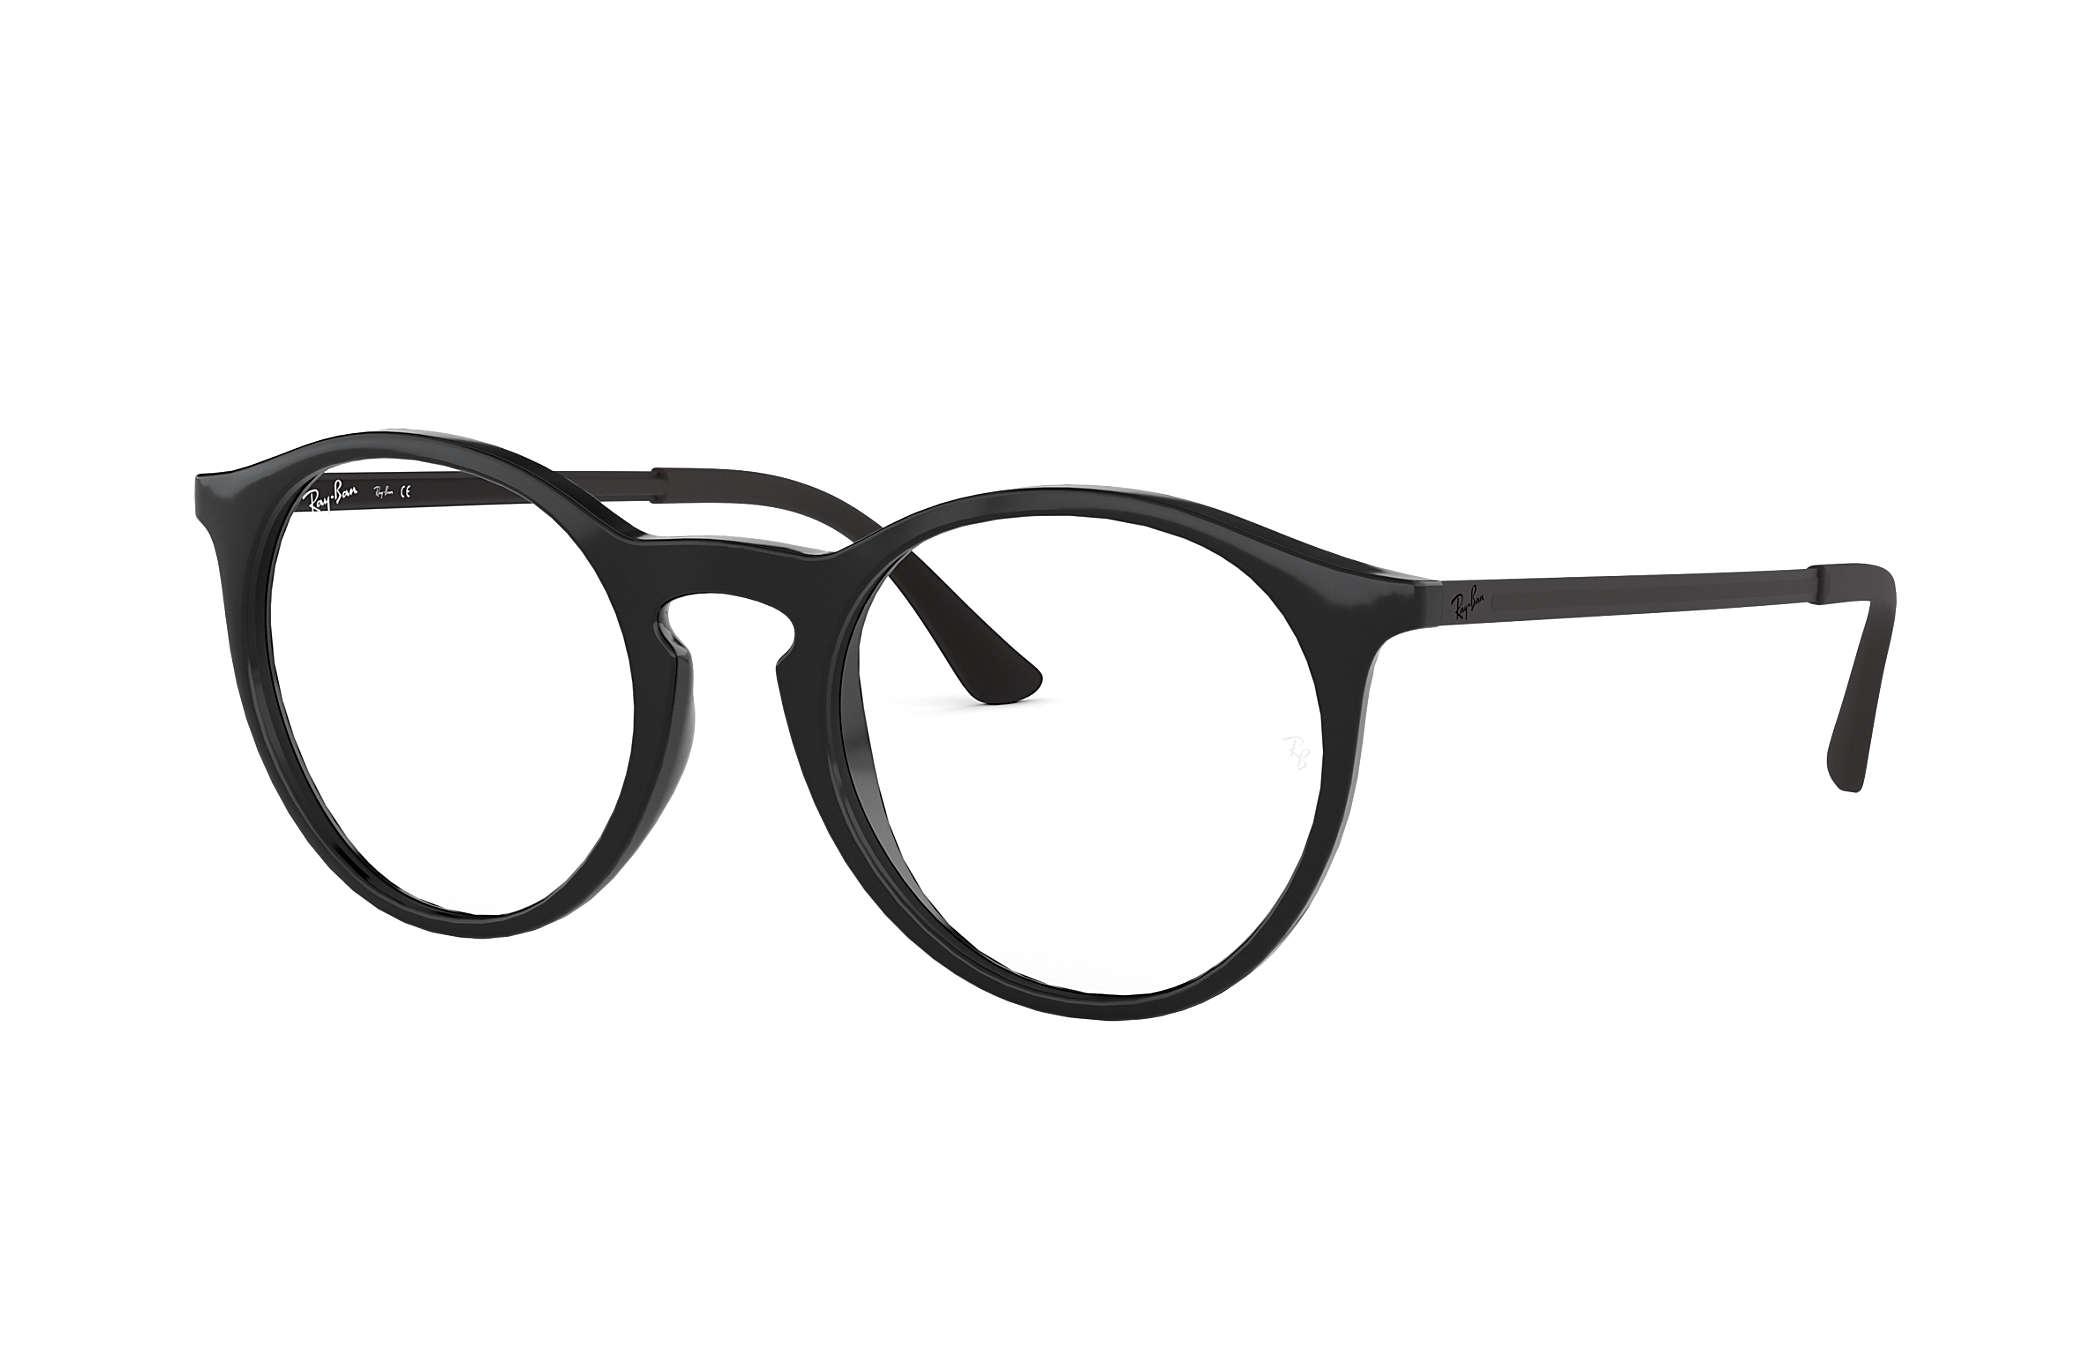 eb6094b290a32 Ray-Ban prescription glasses RB7132 Black - Injected - 0RX7132200050 ...